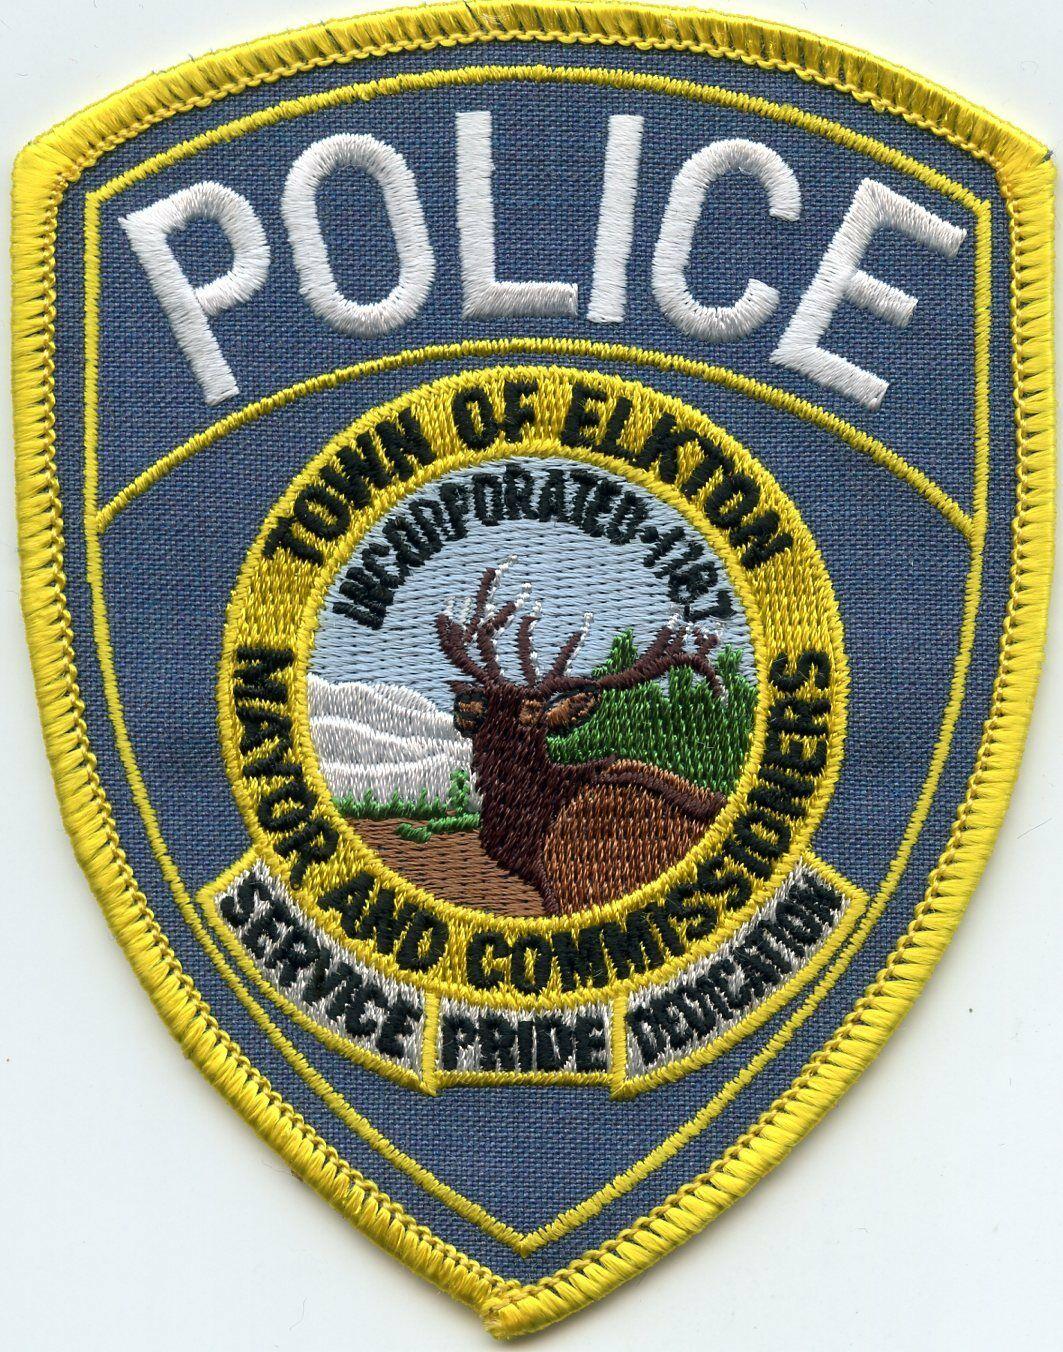 ELKTON POLICE DEPARTMENT, MARYLAND